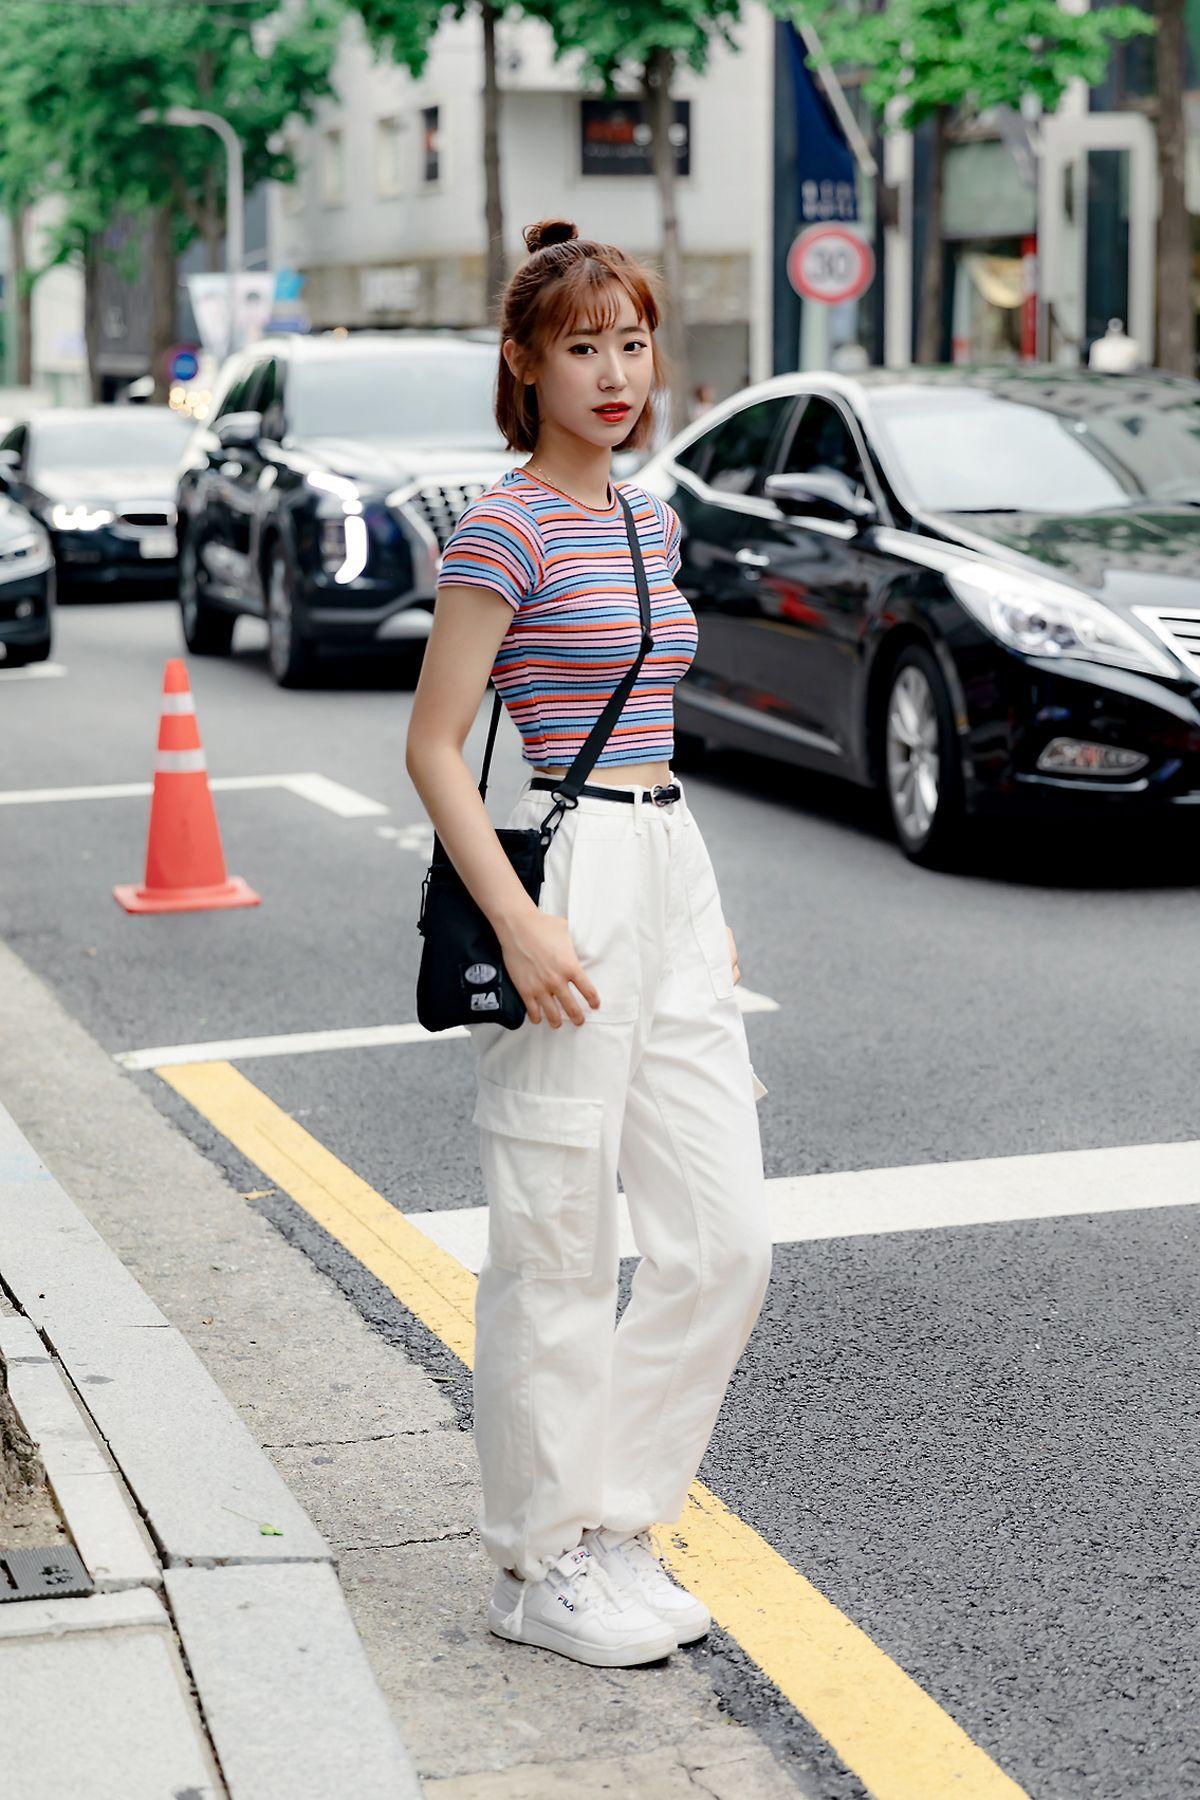 August #Seoul #Street #street styles #street styles 8 #street